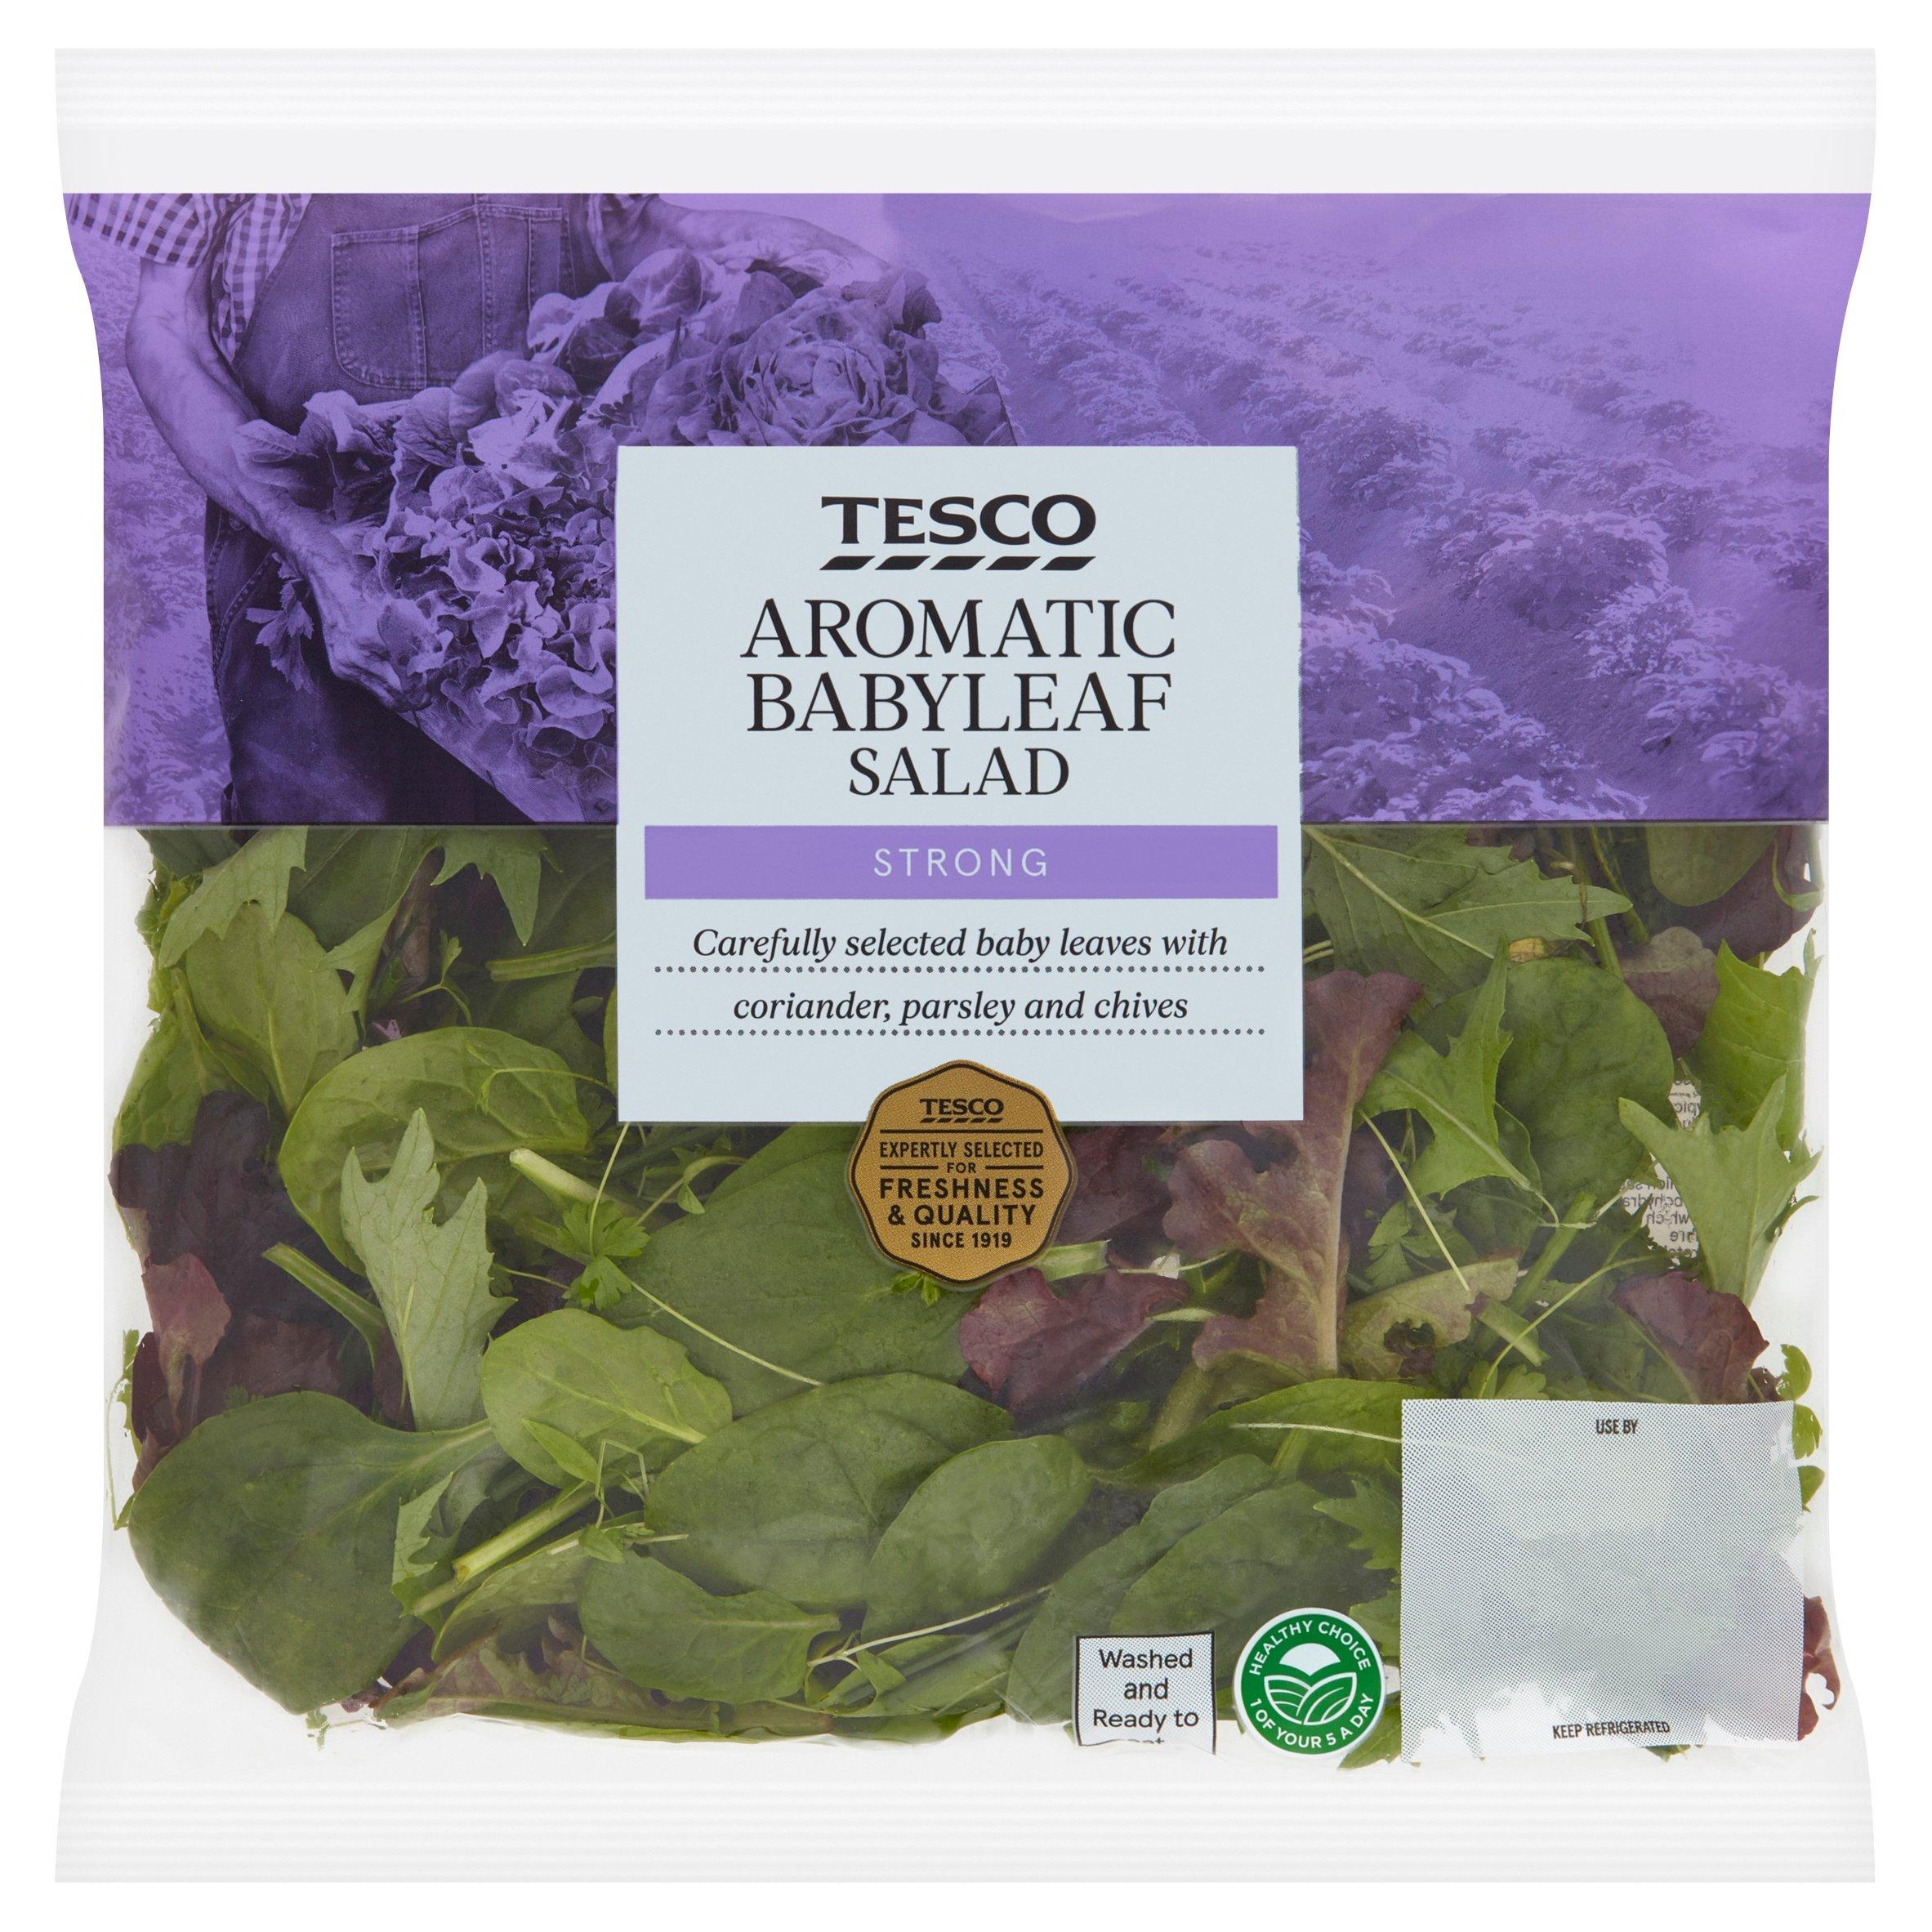 Tesco Aromatic Babyleaf Salad 90G